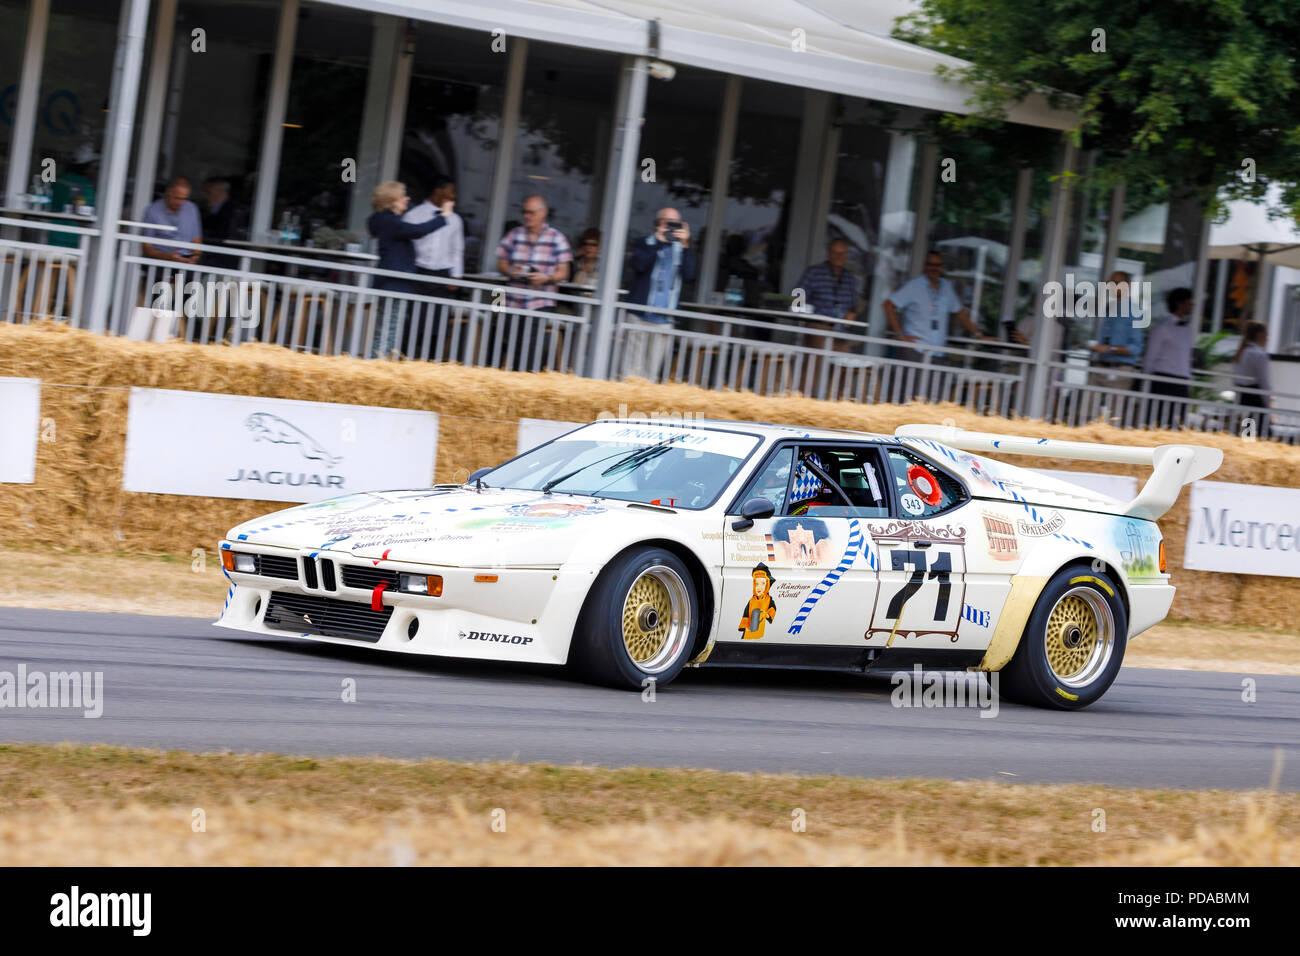 1979 Bmw M1 Procar Sports Racer With Driver Leopold Von Bayern At